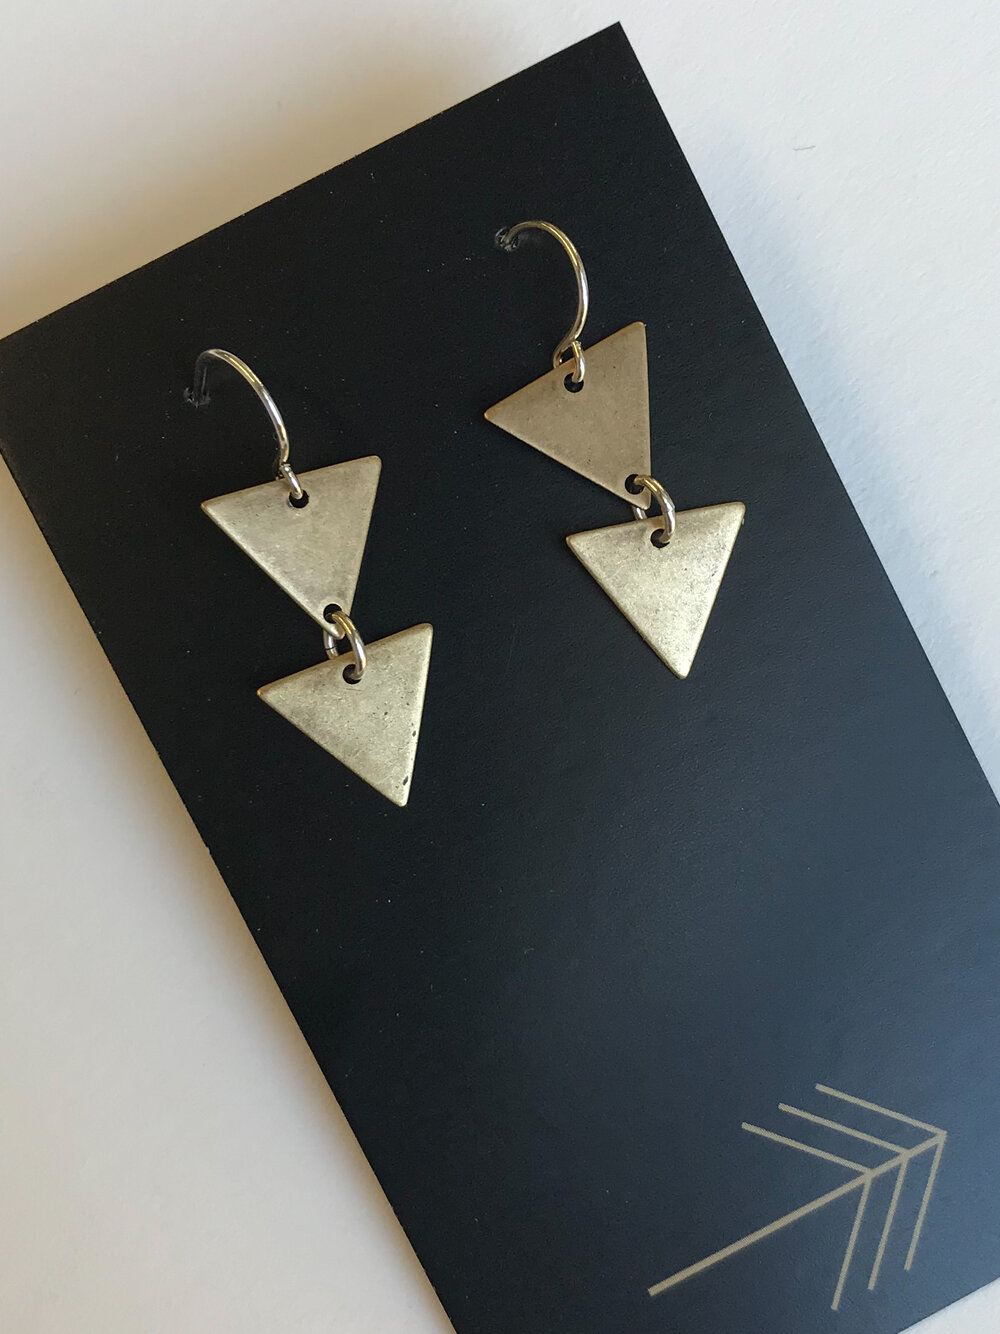 Triangular Earrings............/'Stolen Pride/' Ceramic Jewelry Ceramic Earrings Geometric Earrings Triangle Earrings Green Earrings